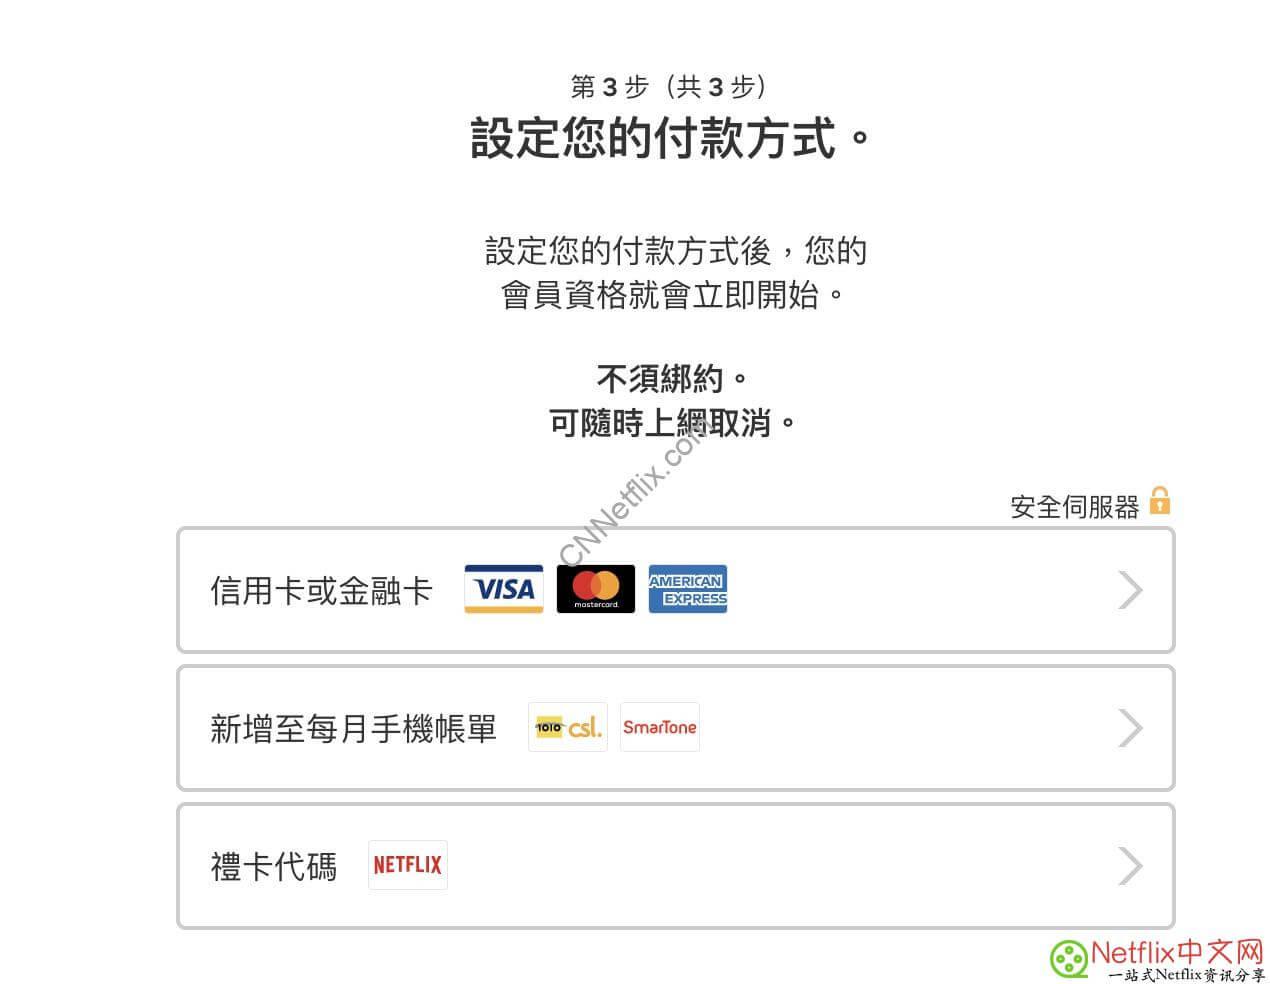 Netflix注册教程,在中国如何成功注册Netflix账号?